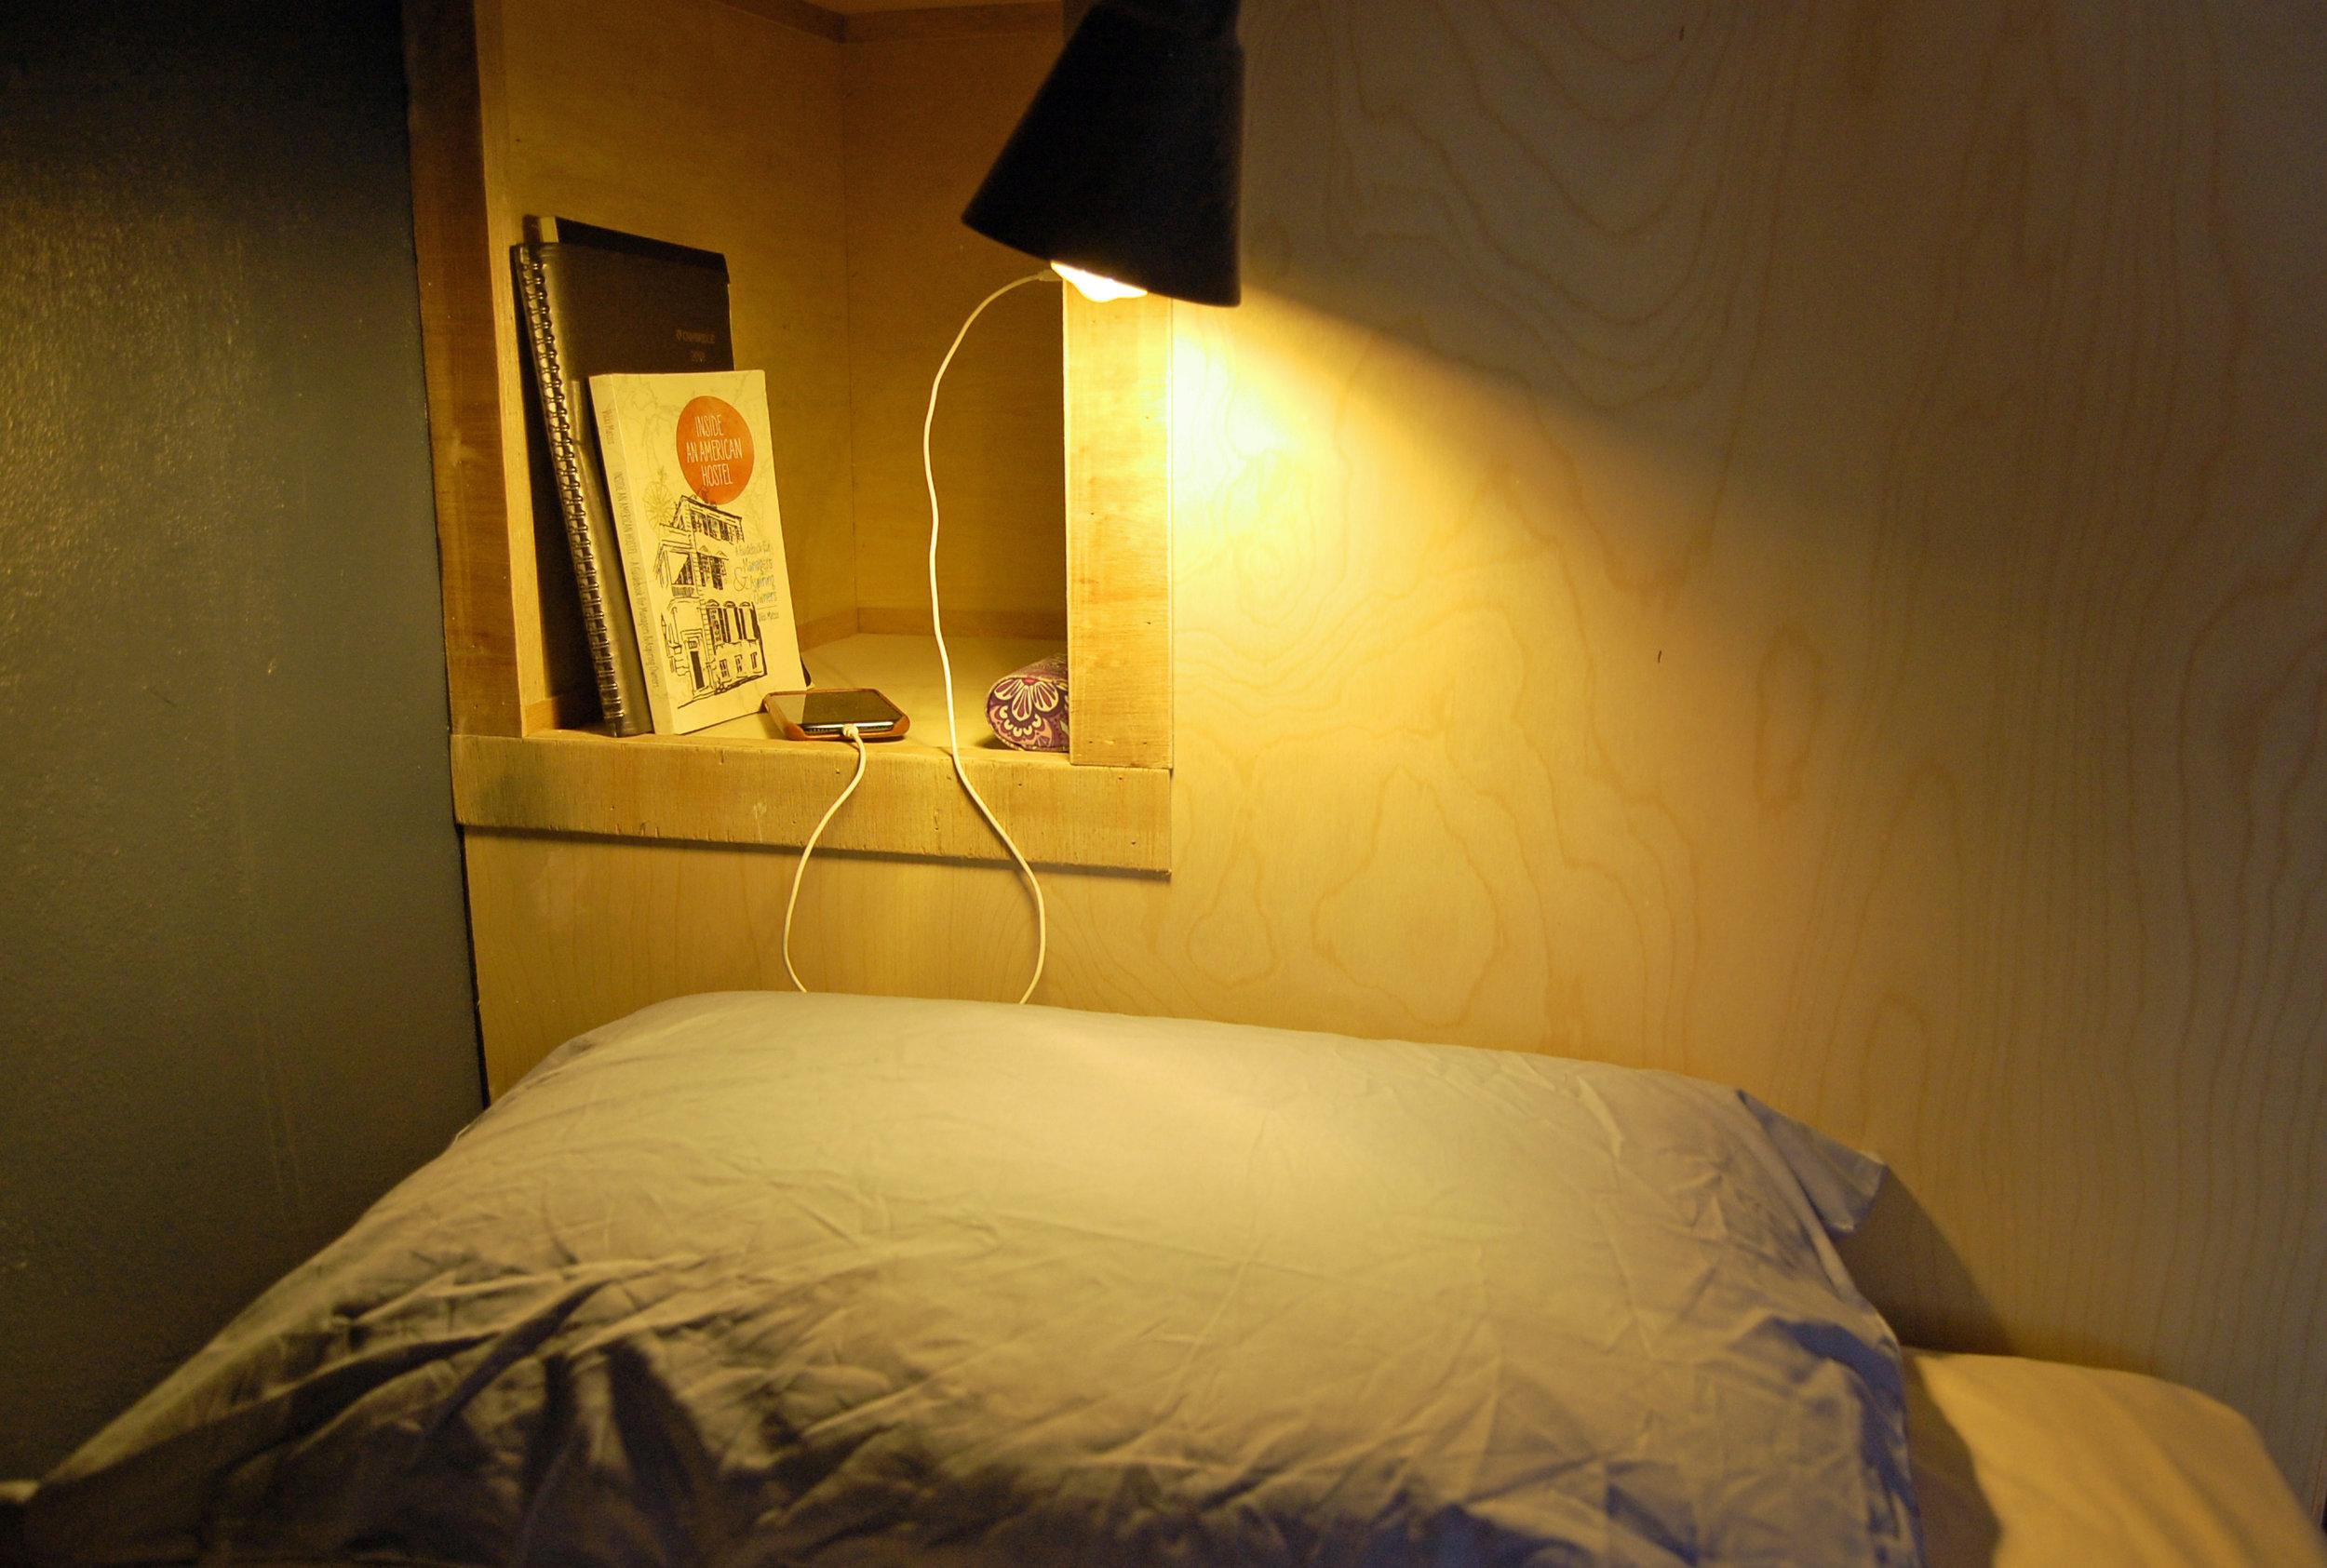 hostel_cubby.jpg